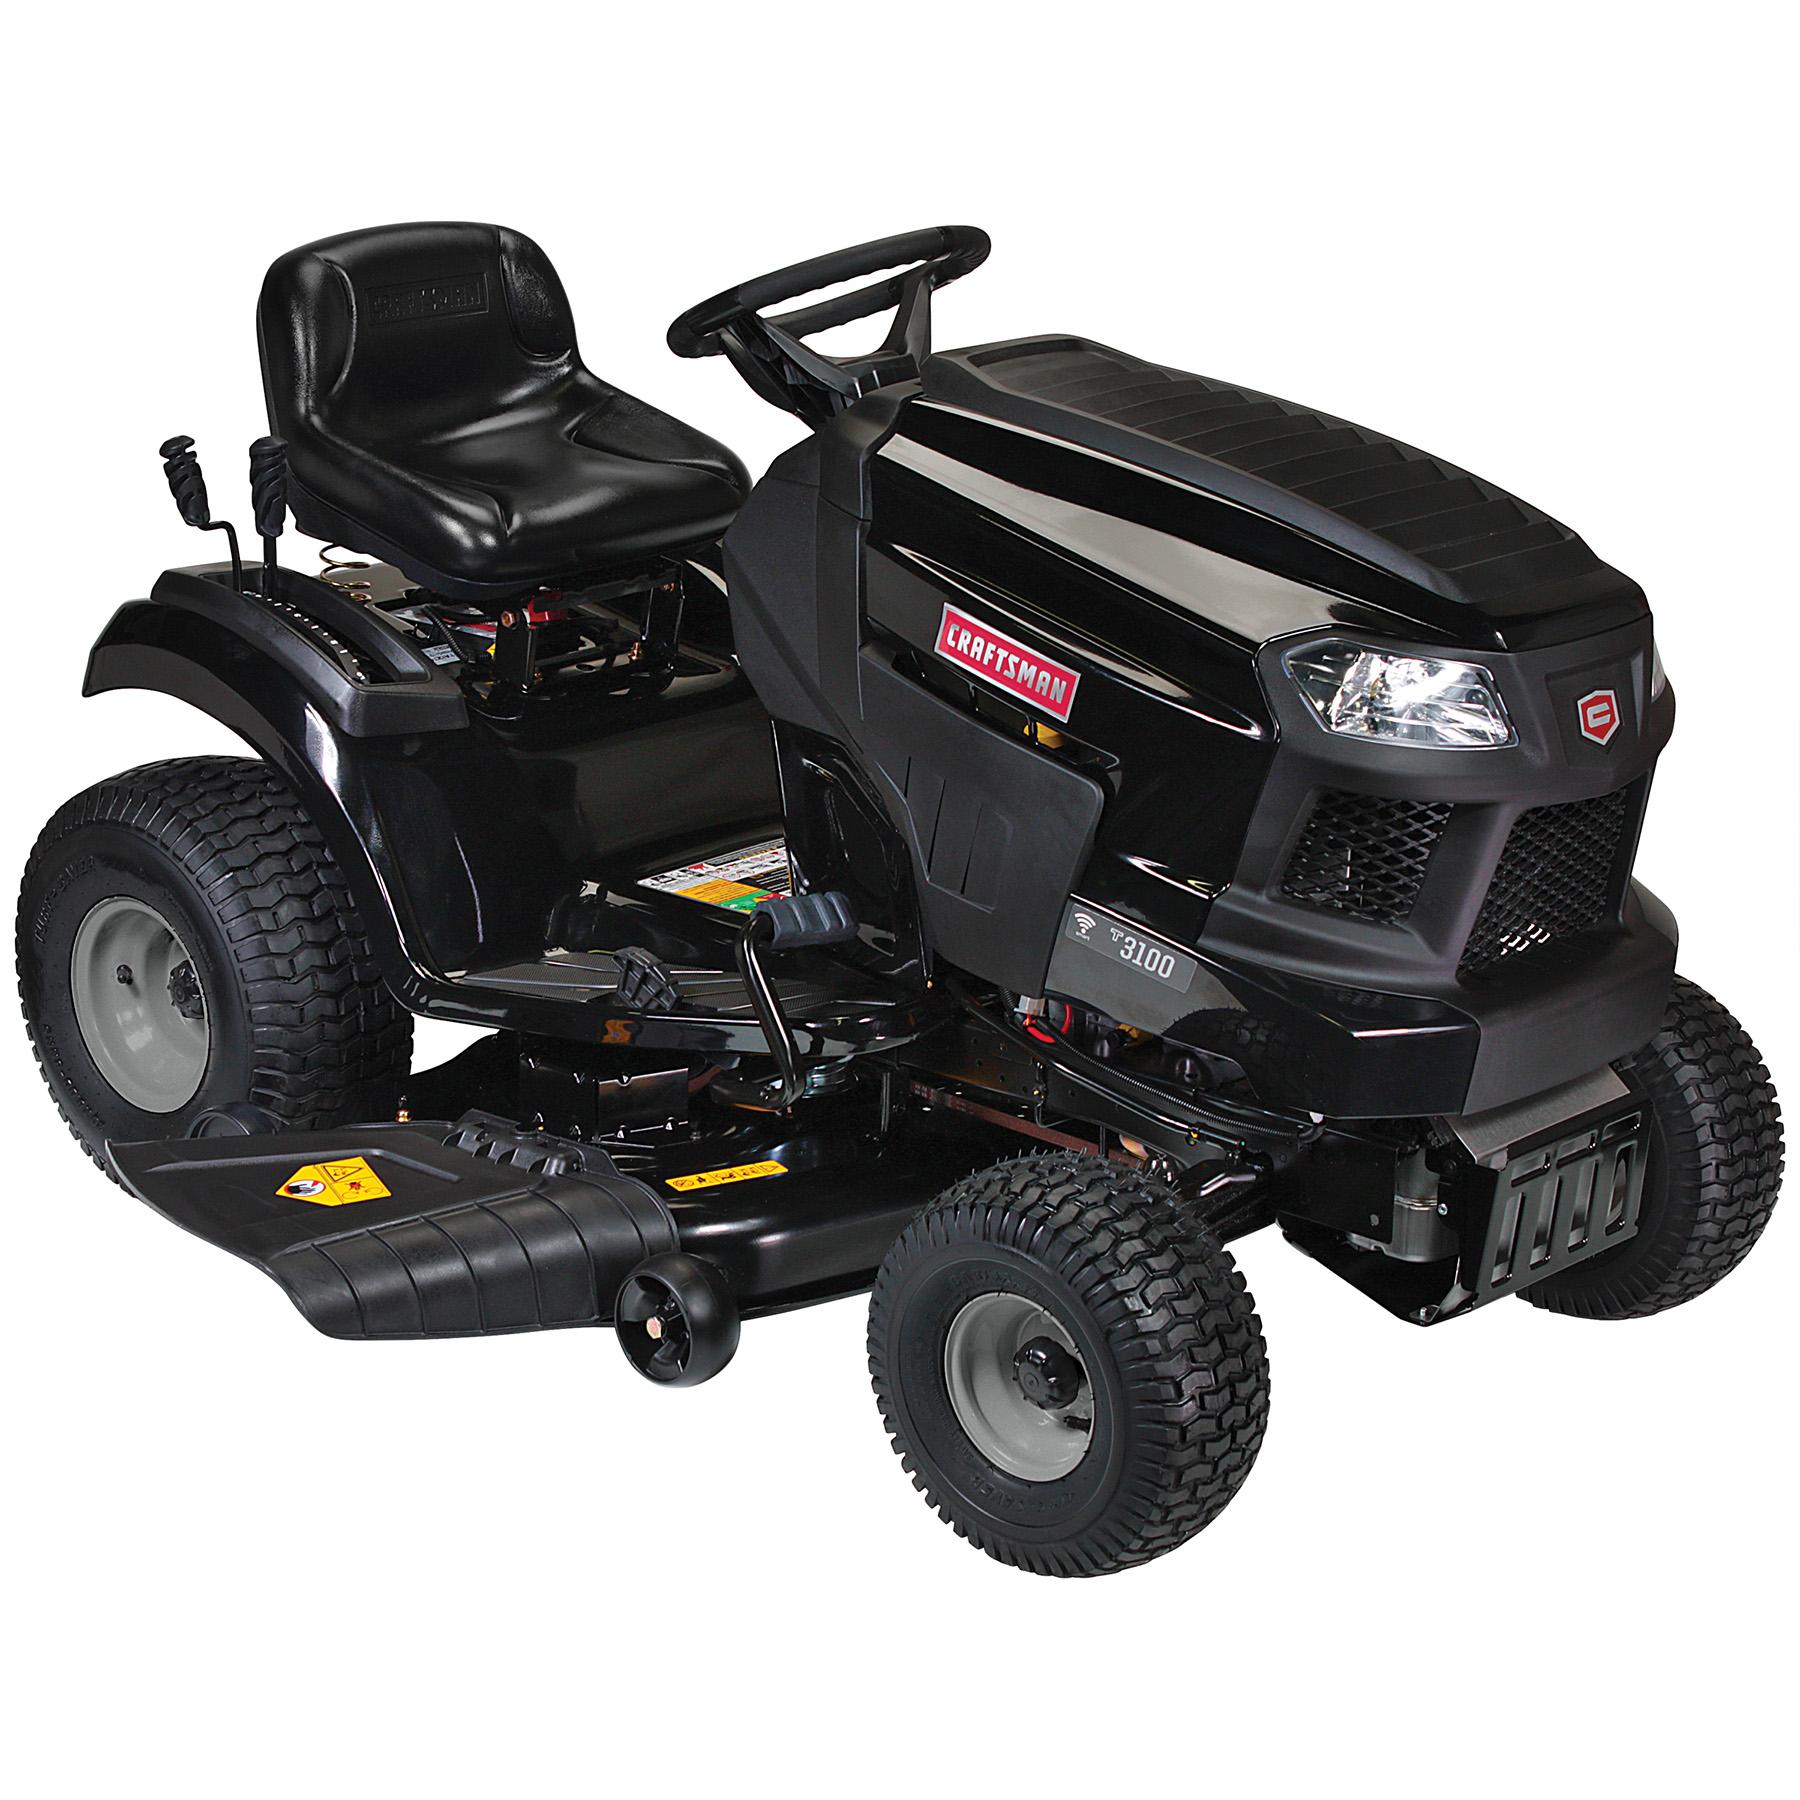 manual craftsman lt 1000 21.5 hp rider mower